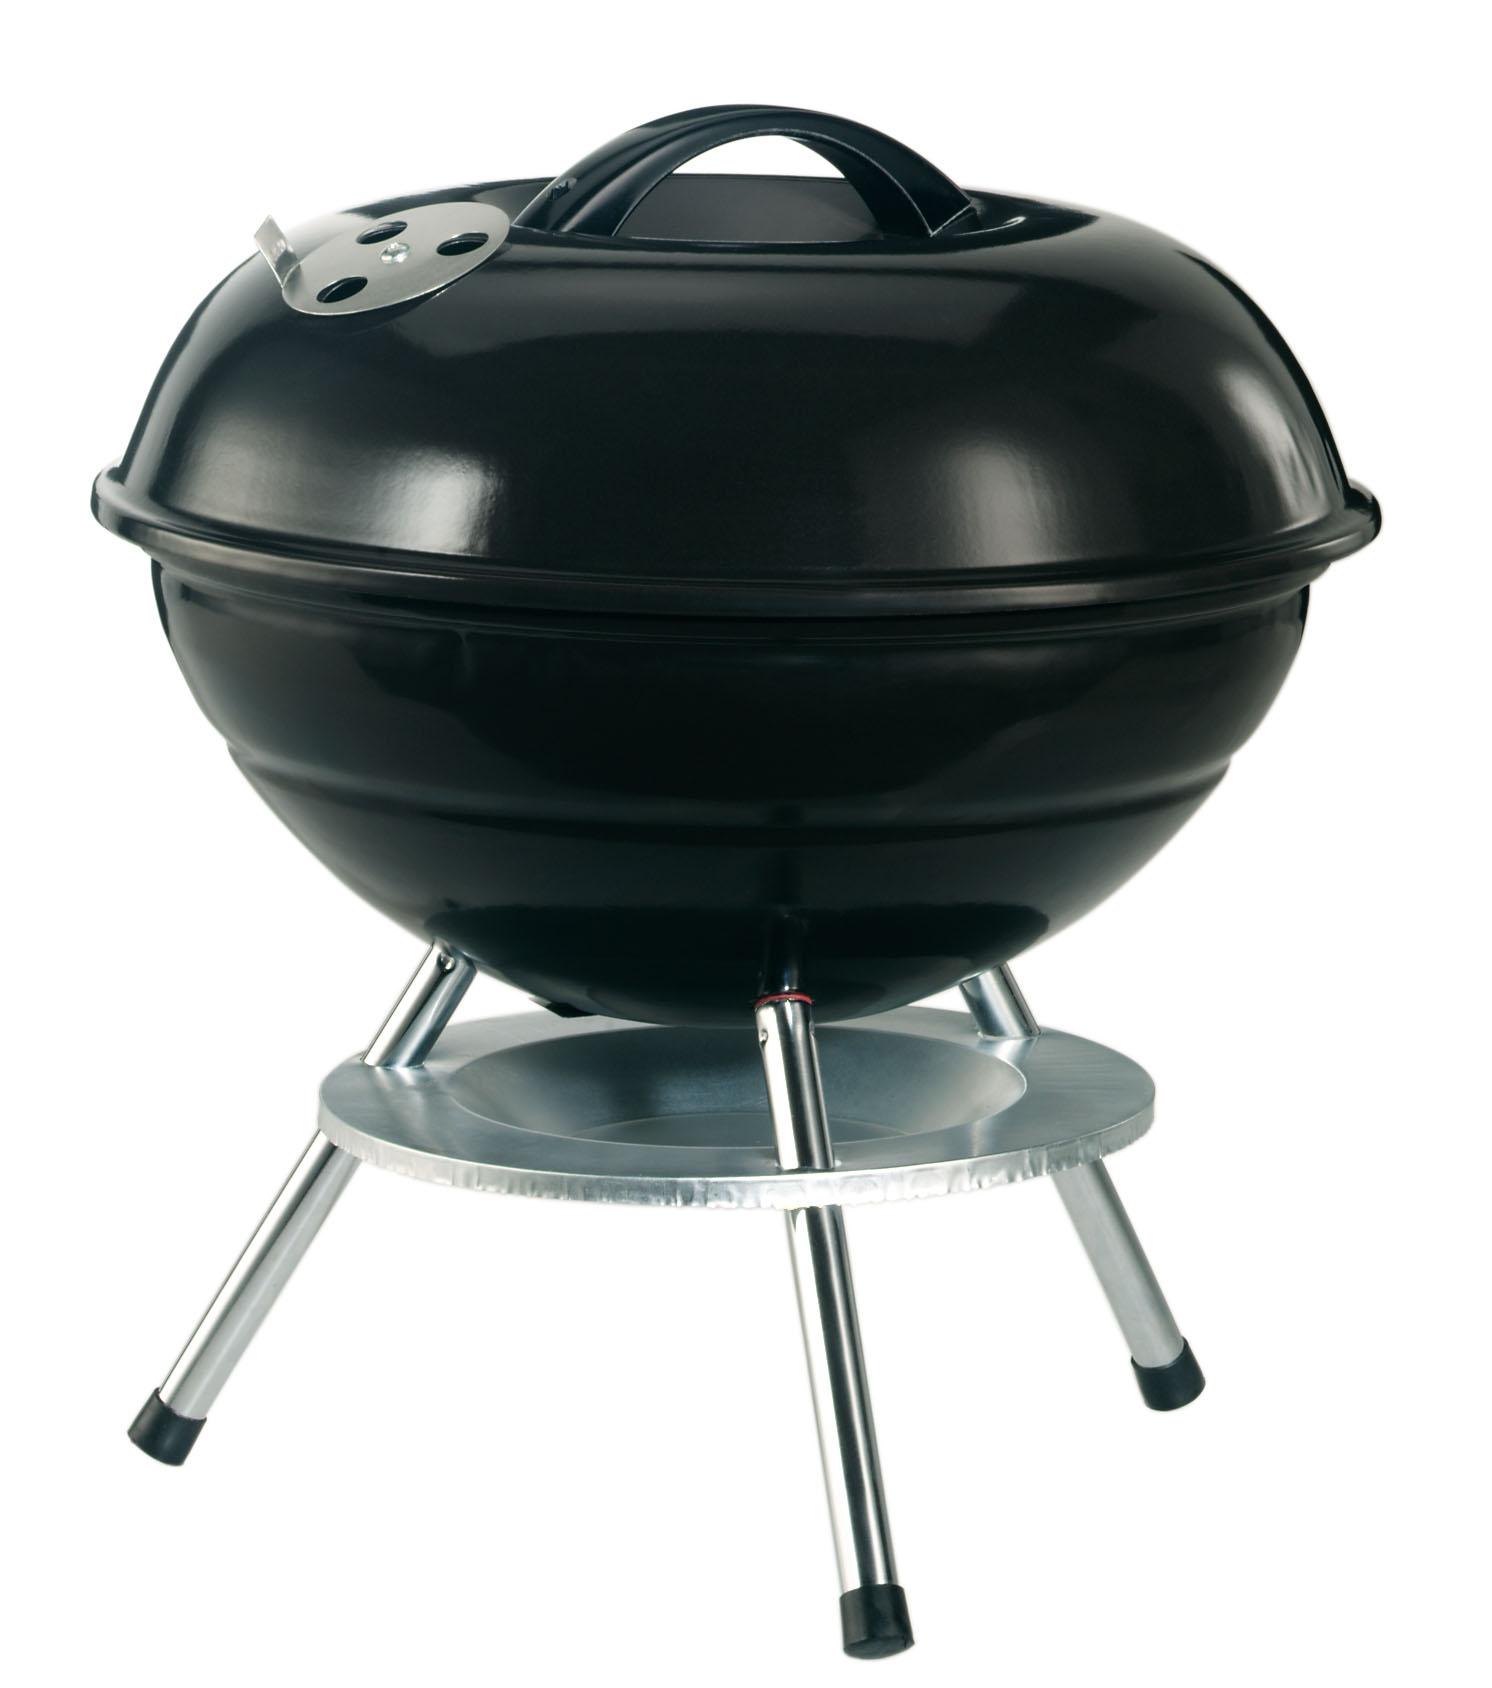 Kogelgrill Tafelmodel Barbecue 35 cm Garden Grill